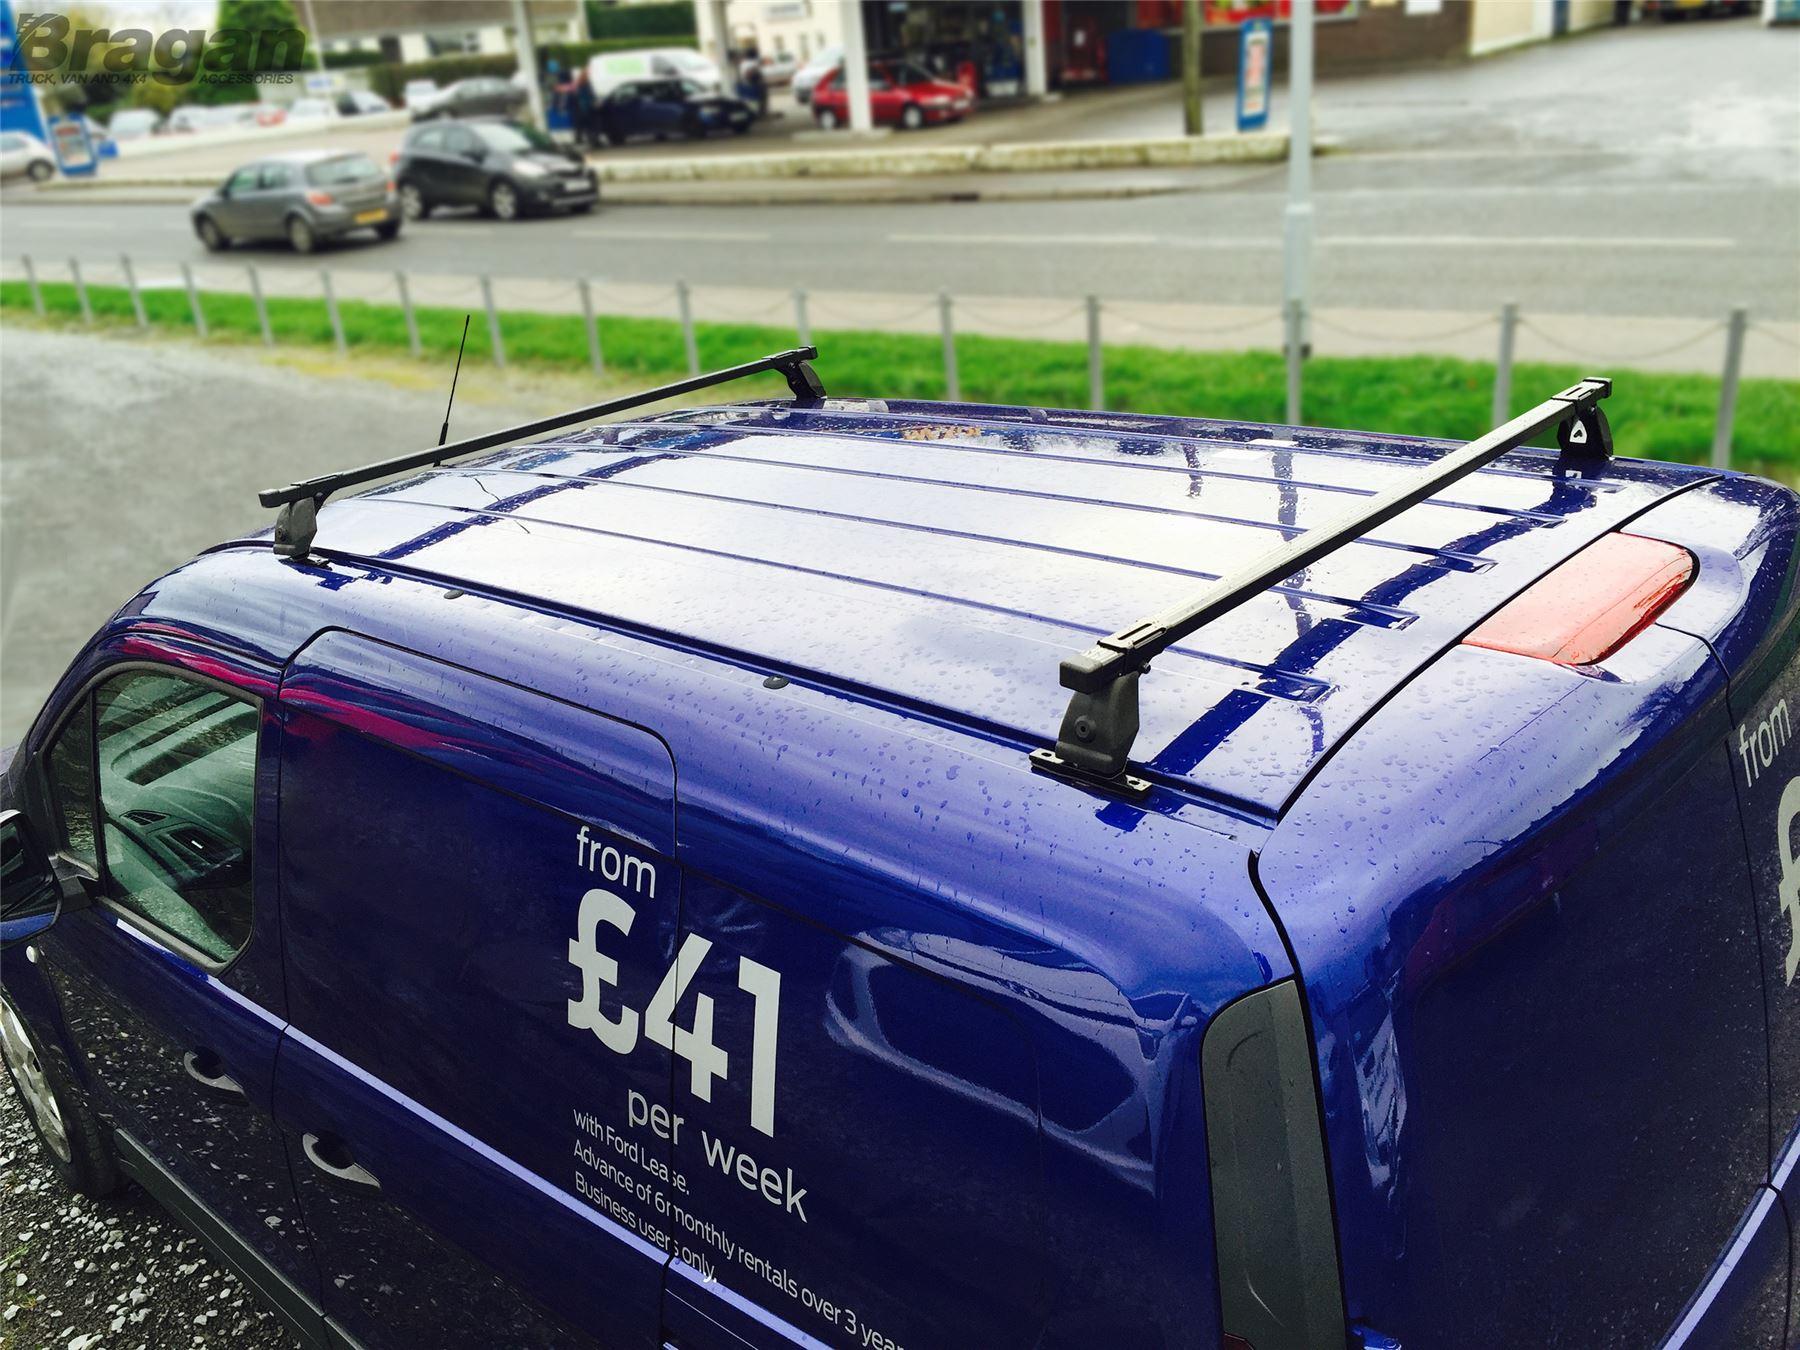 Used 2015 Ford Transit Van Consumer Reviews - 27 Car ...